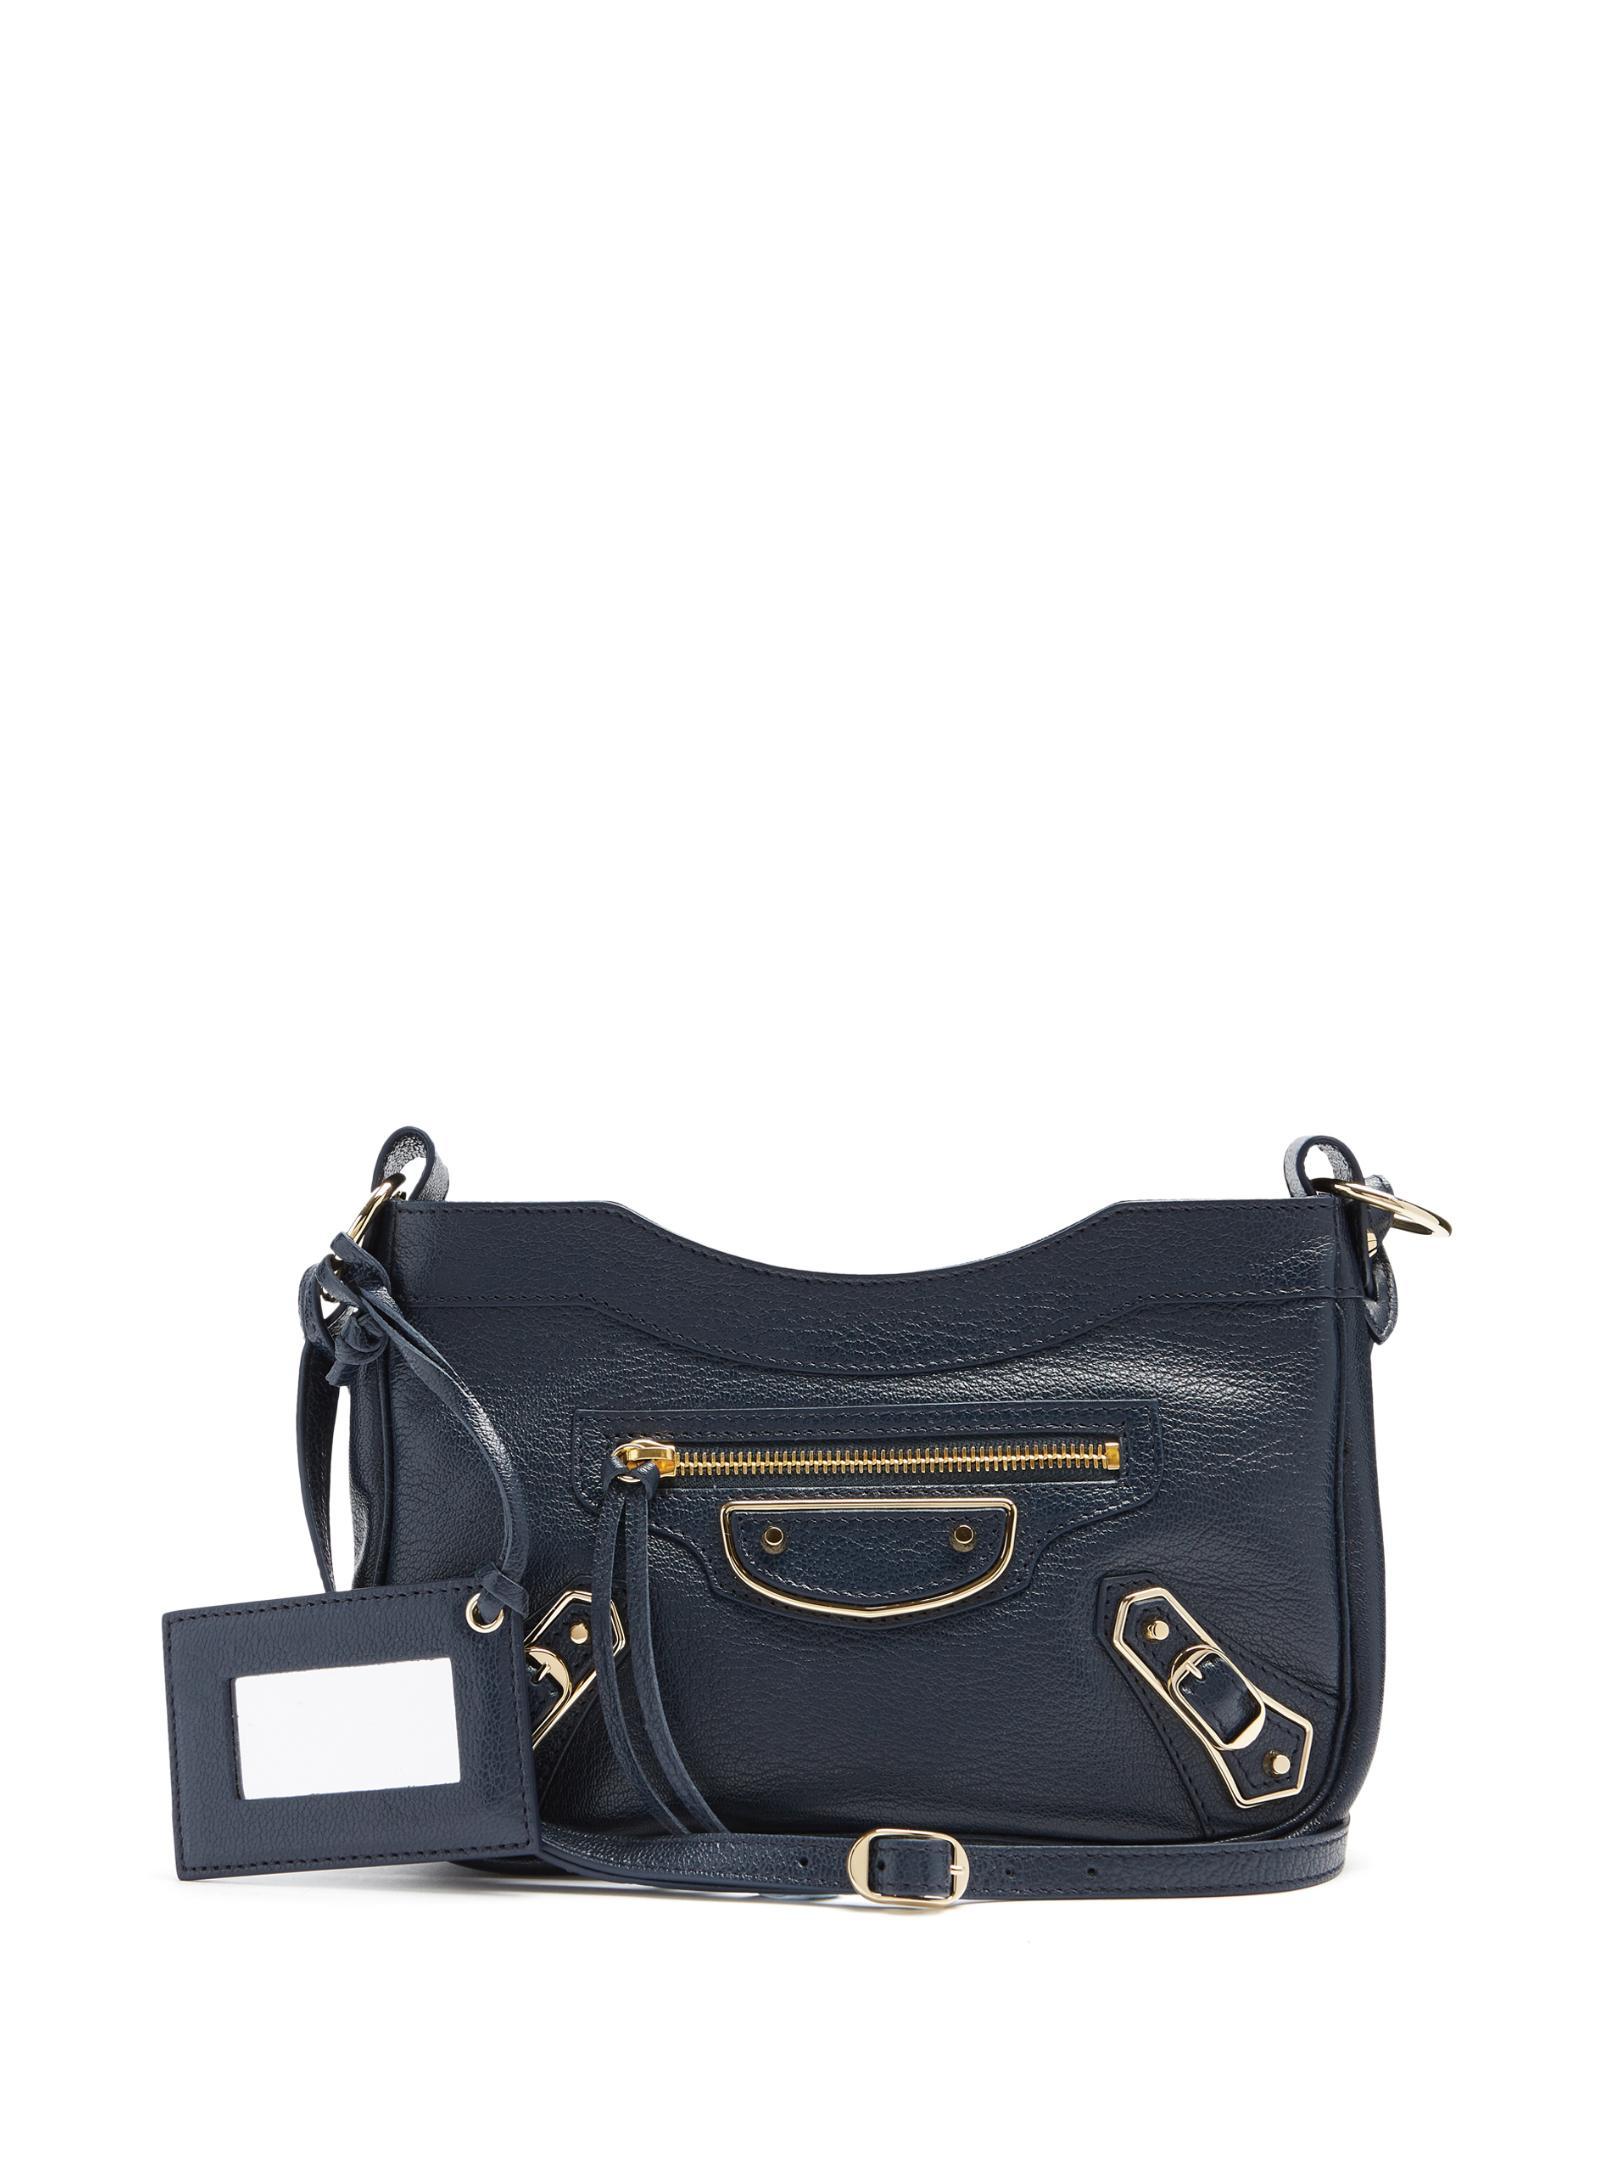 d8f3d15f64 Balenciaga Classic Metallic Edge Hip Cross-body Bag in Blue - Lyst